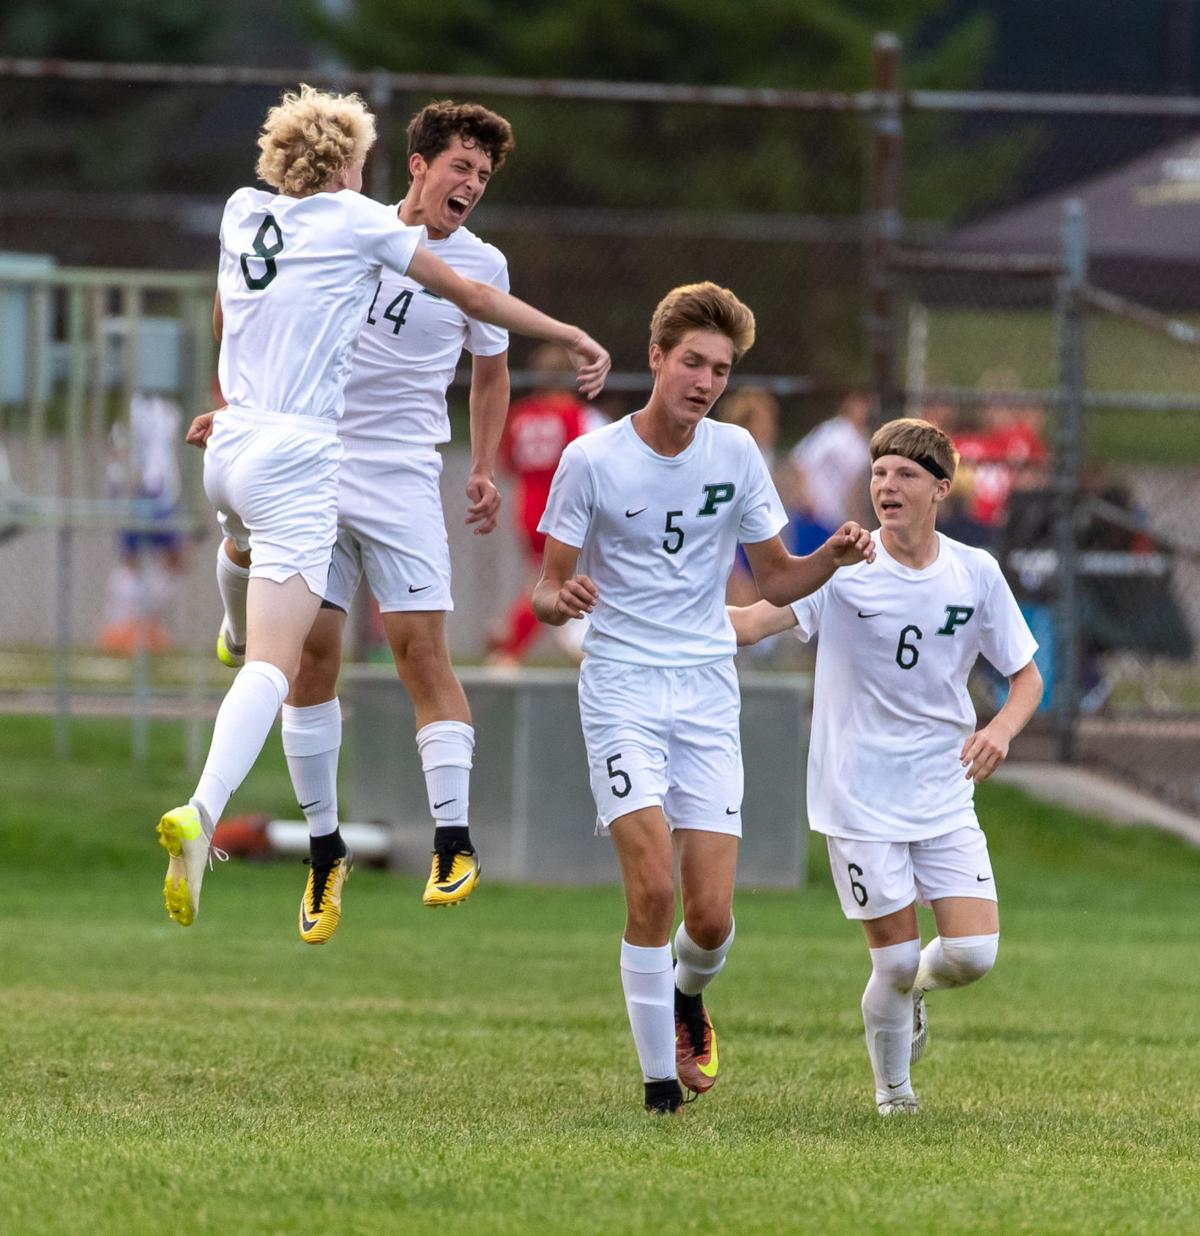 Govs boys soccer team gets first win under DeBoer | Local